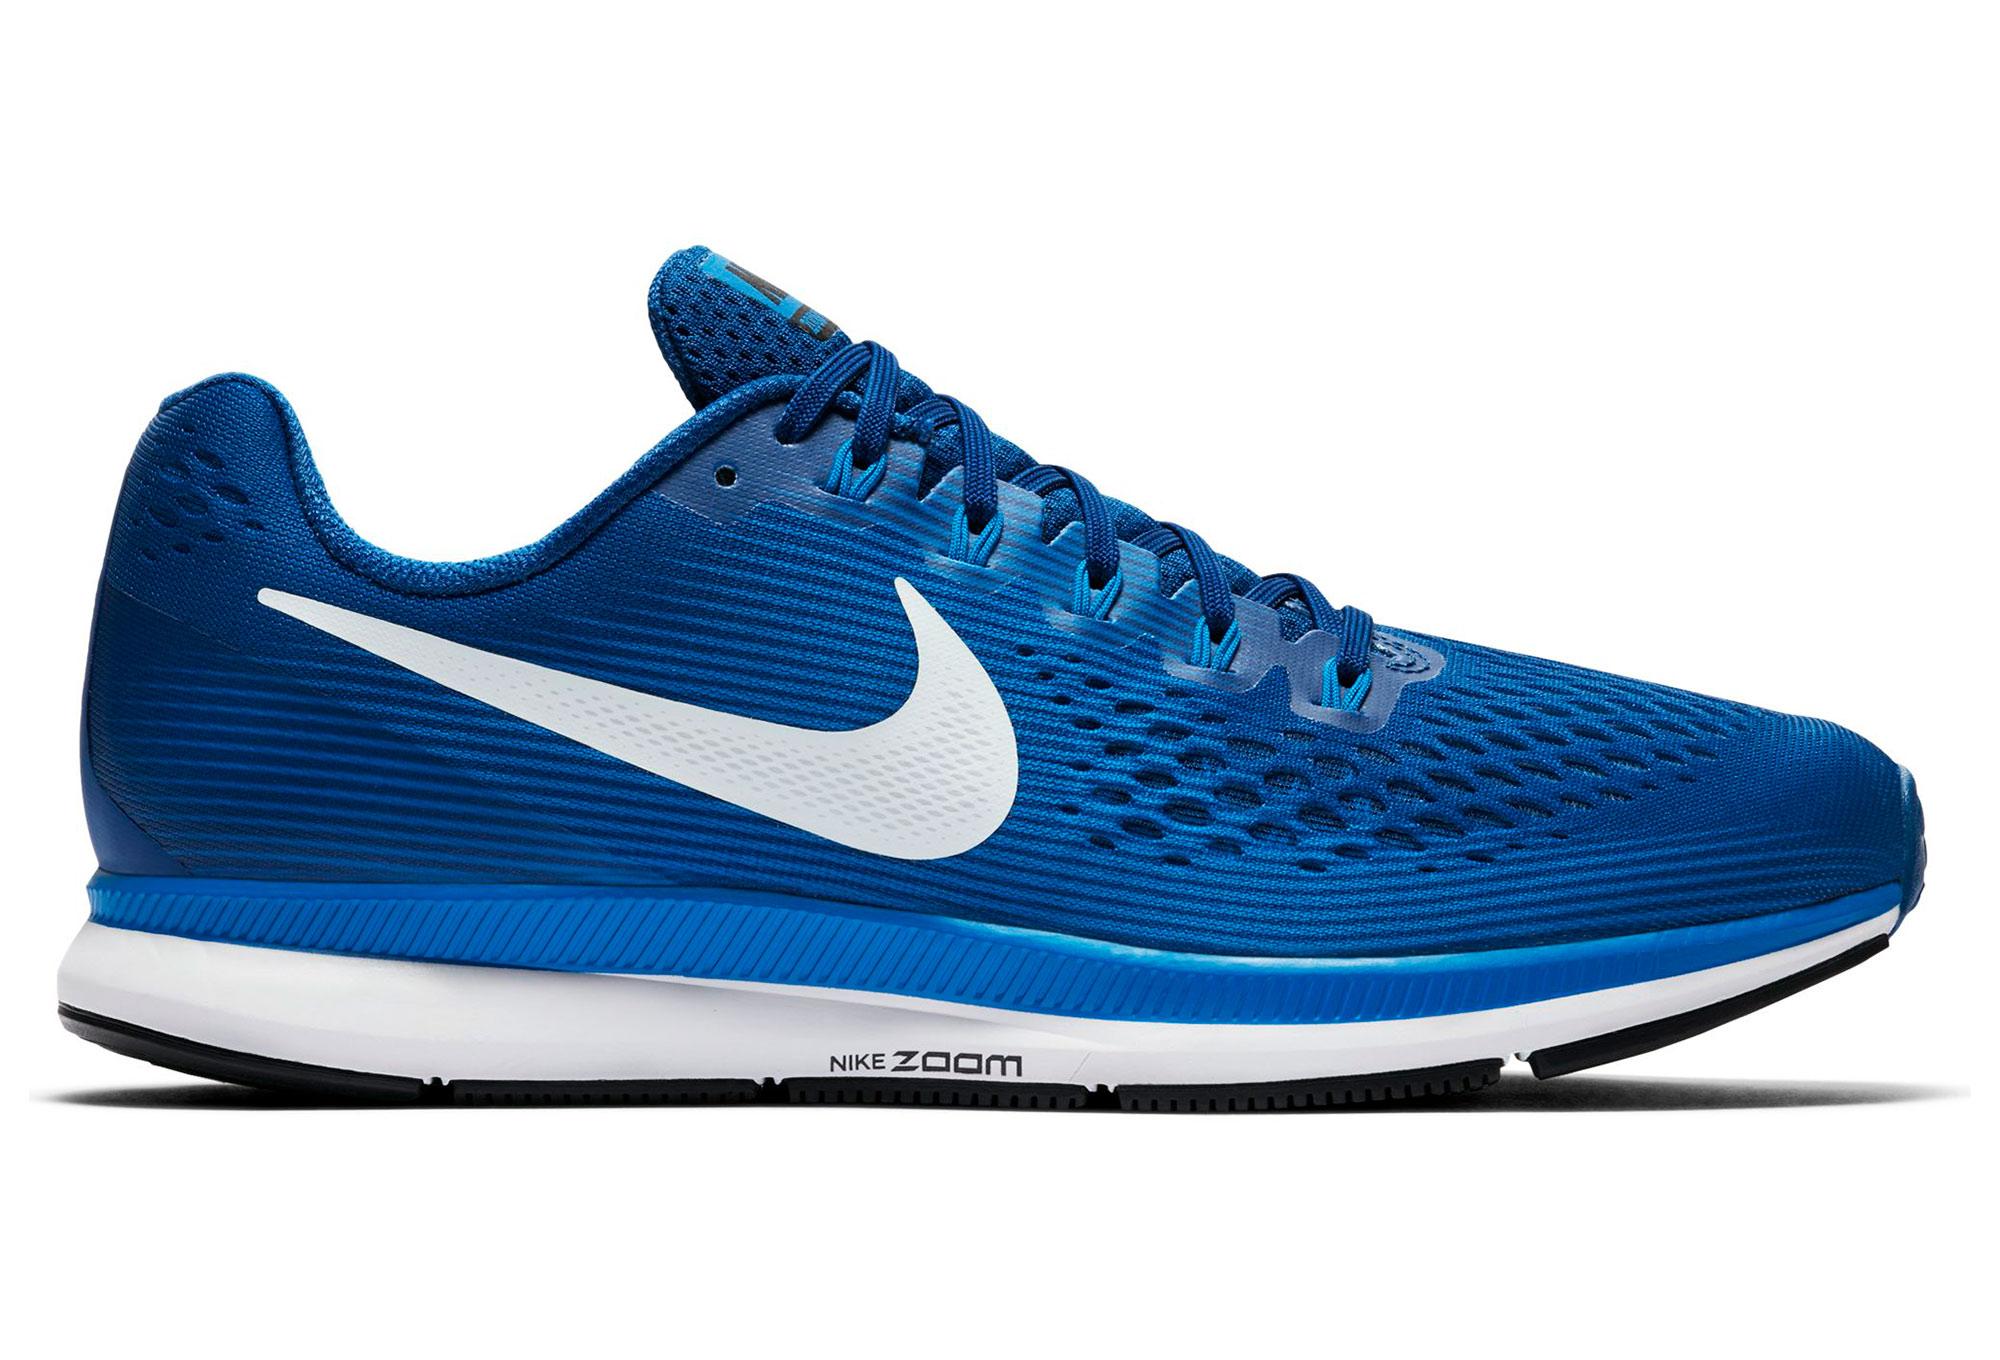 537c22768843 ... best price zapatillas nike air zoom pegasus 34 para hombre 399d8 7aaa4